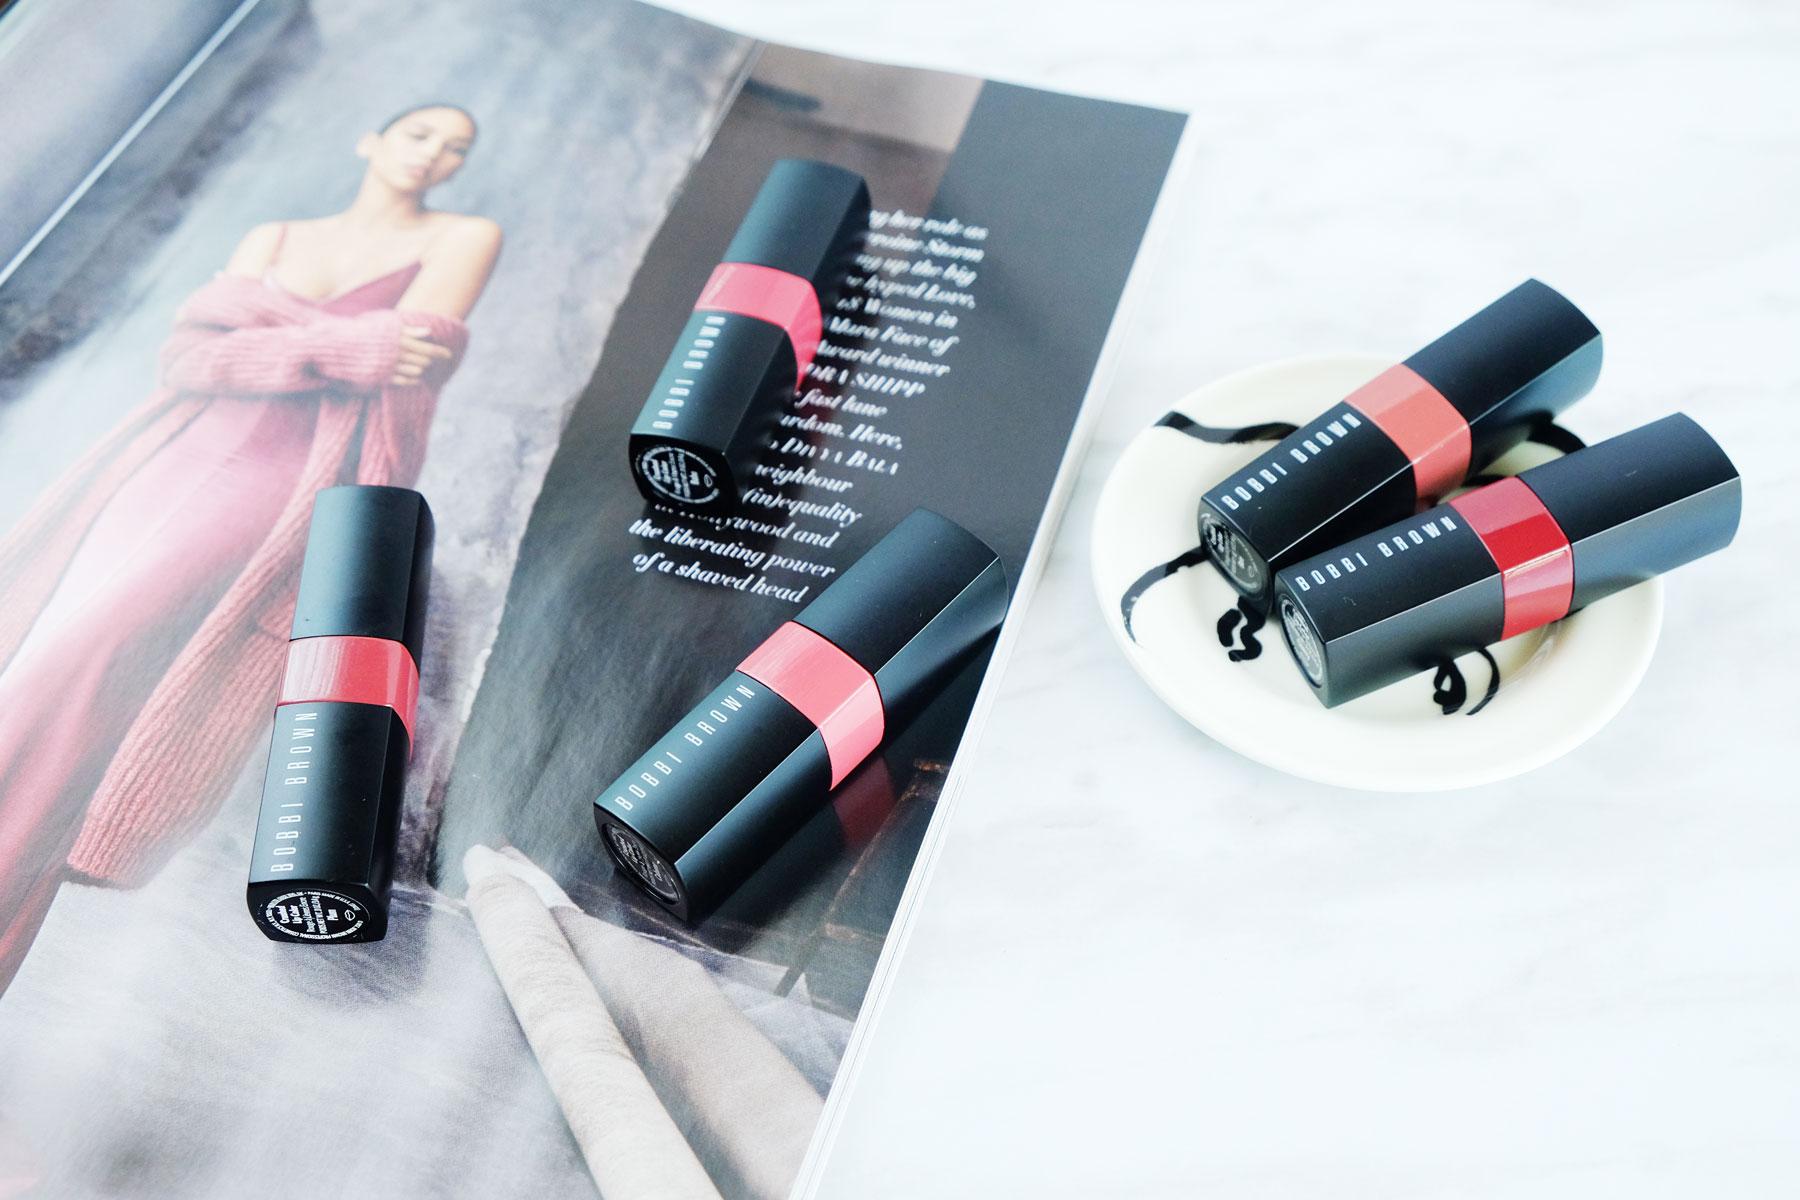 The perfect everyday wear lipsticks - the Bobbi Brown Crushed Lipstick range. #bobbibrown #lipstick #makeup